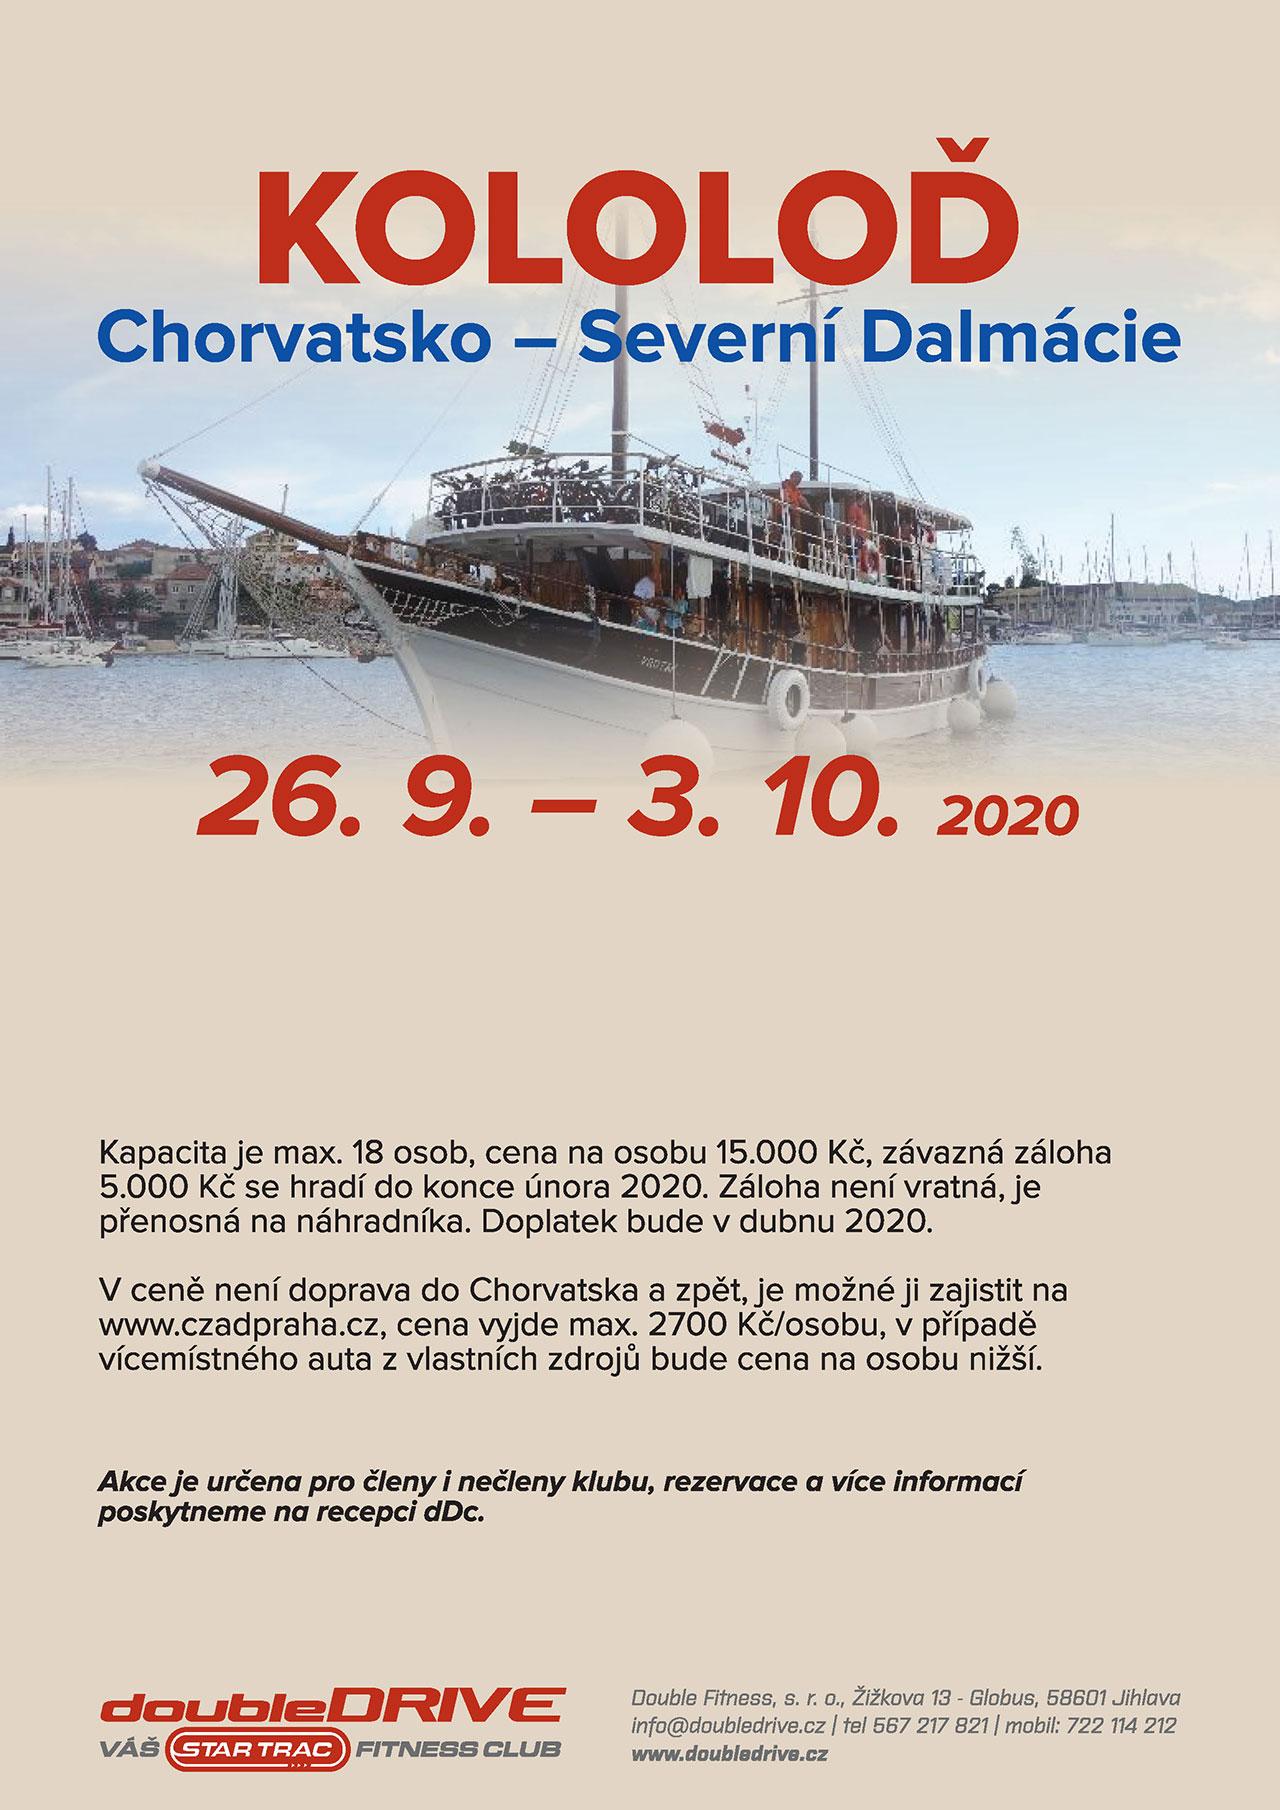 Ddc Kololod 2020 1